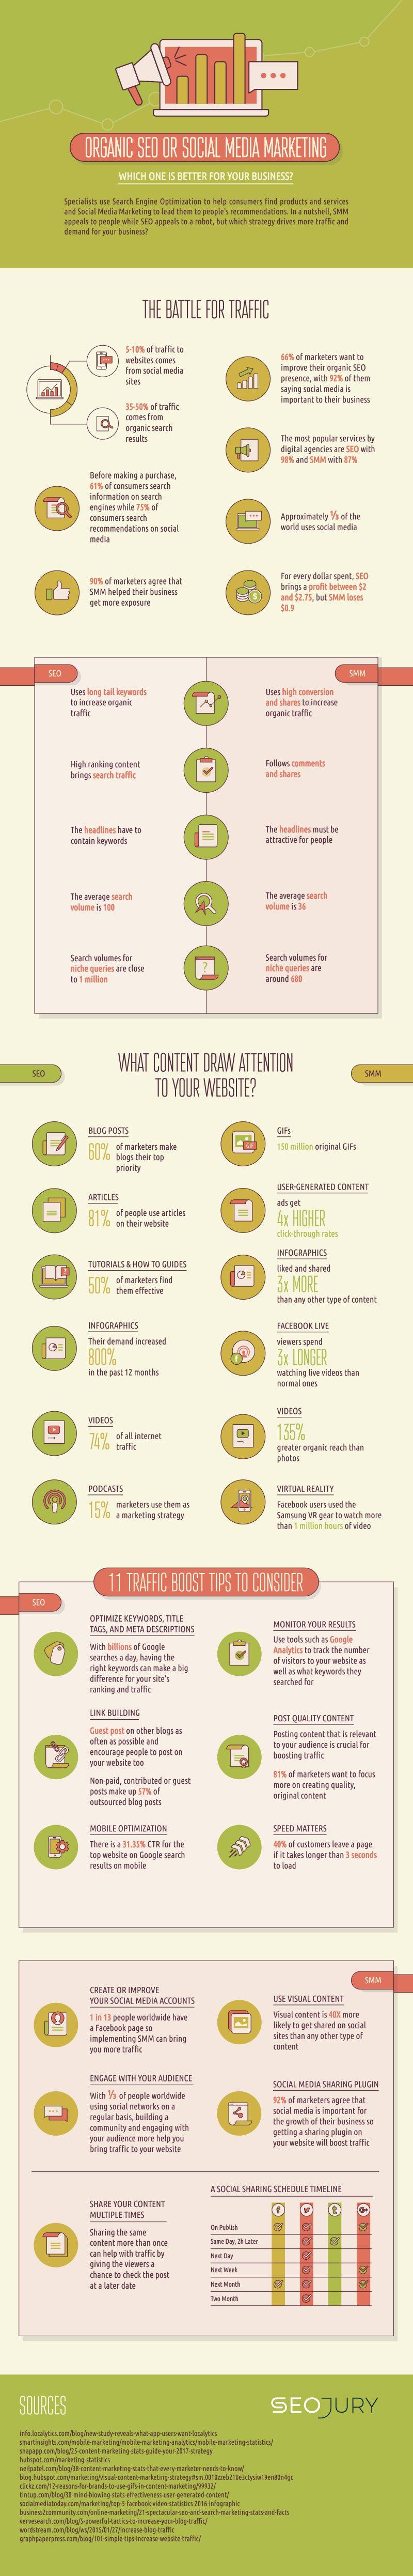 SEO-or-Social-Media-Marketing-11-Traffic-Boosting-Tips-for-Success-1